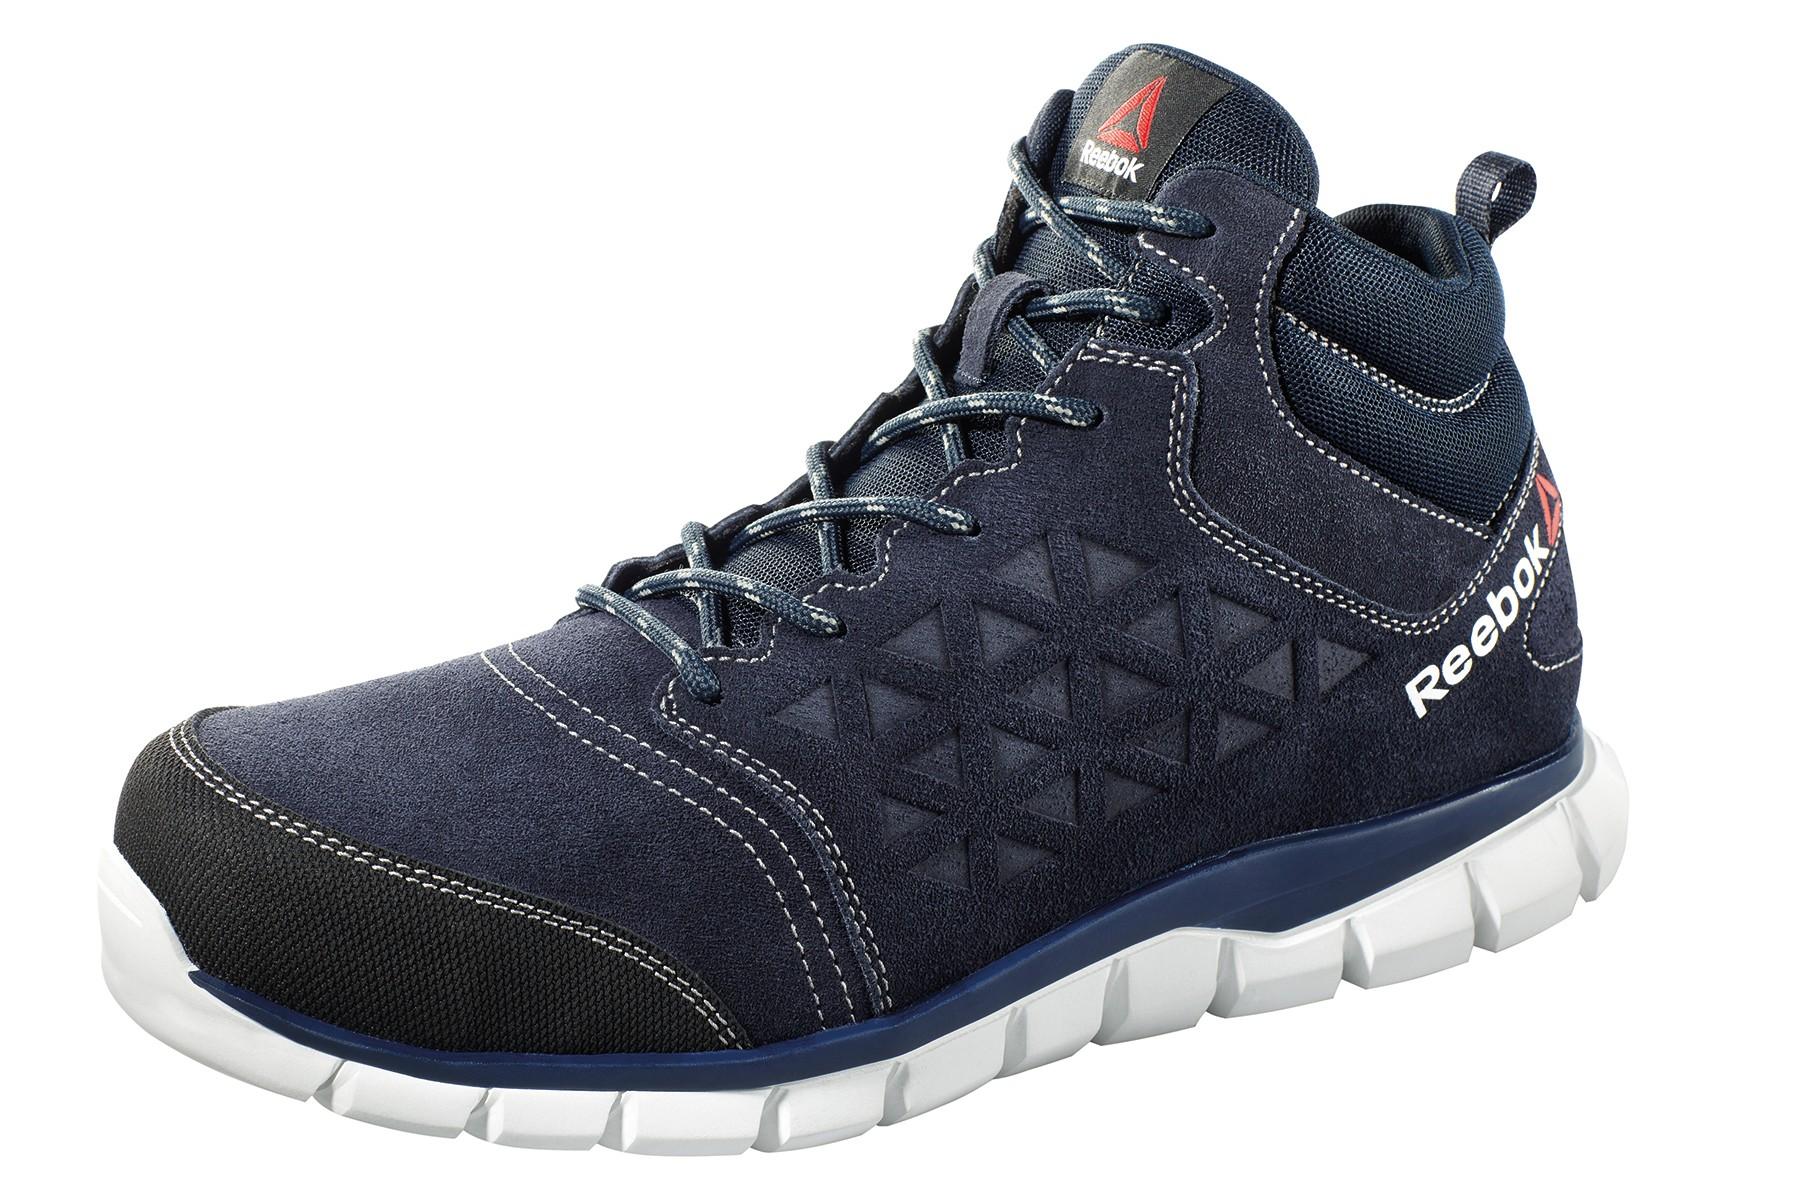 scarpe antinfortunistiche reebok excelite s1p src ib1030